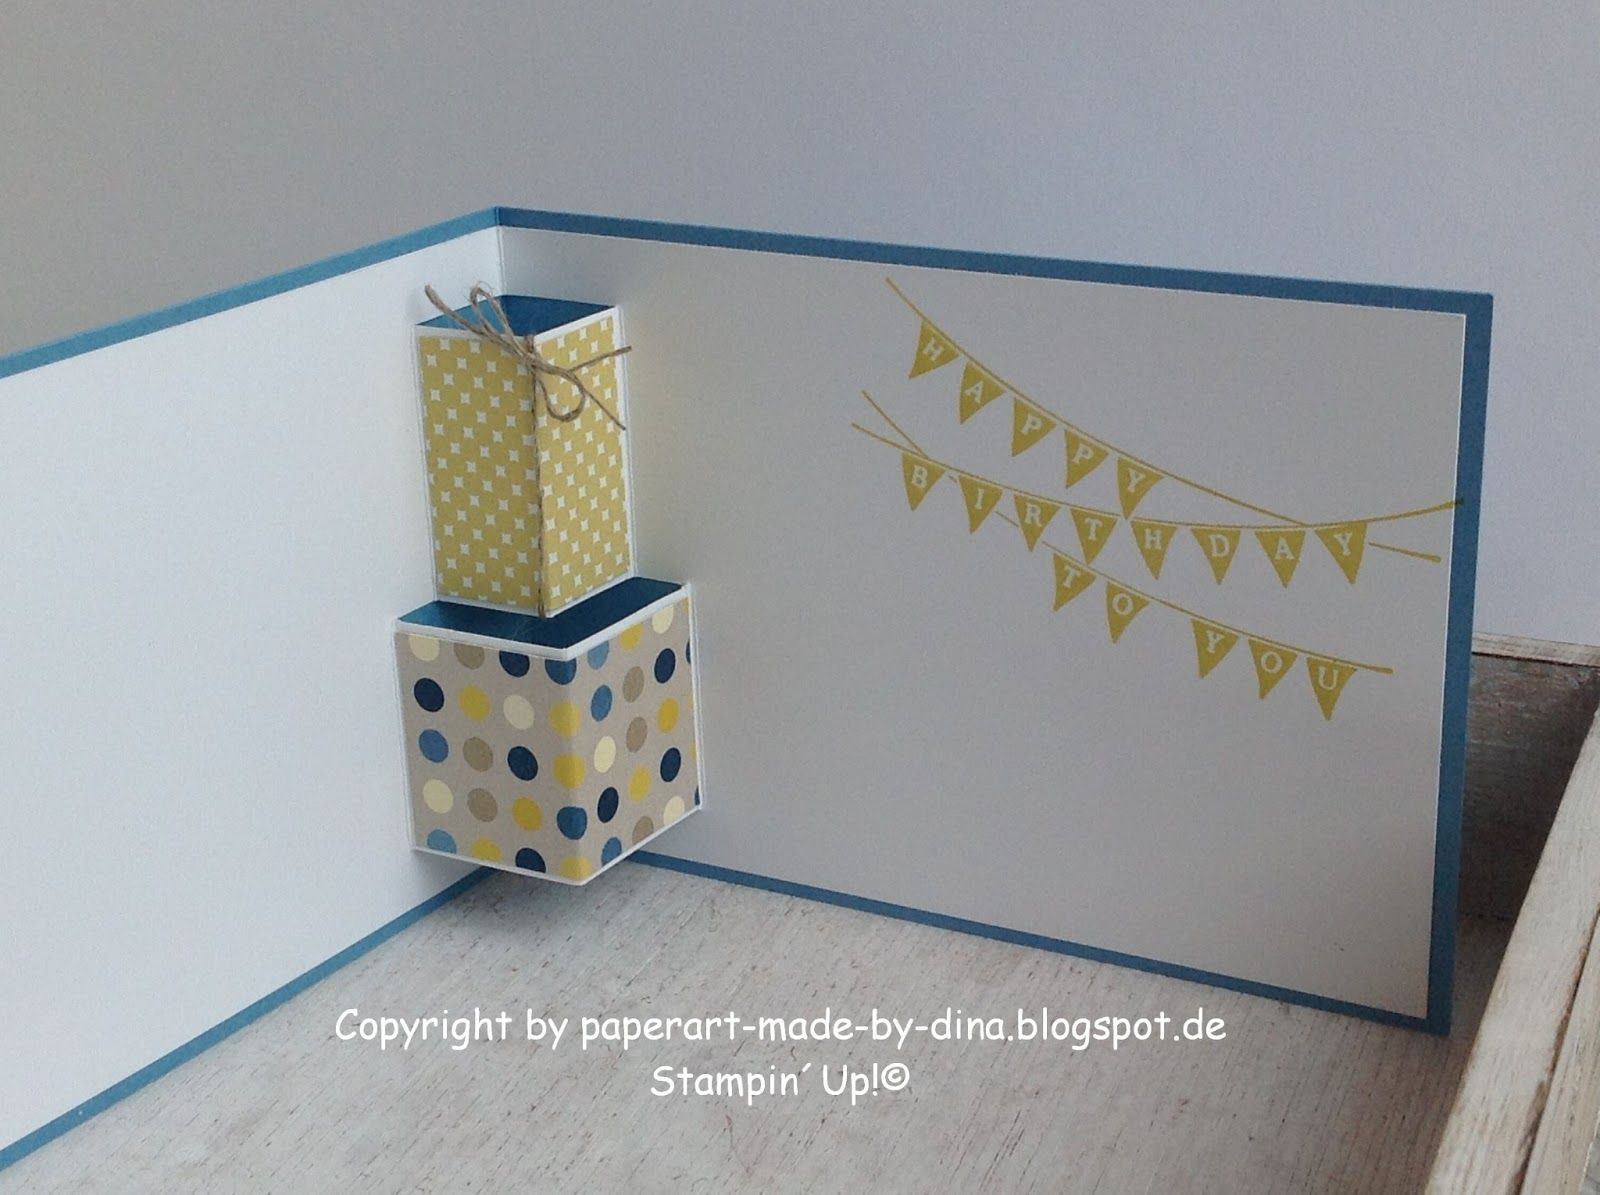 sch nes aus papier handgemacht popup karte mit anleitung popupcards pinterest papier. Black Bedroom Furniture Sets. Home Design Ideas